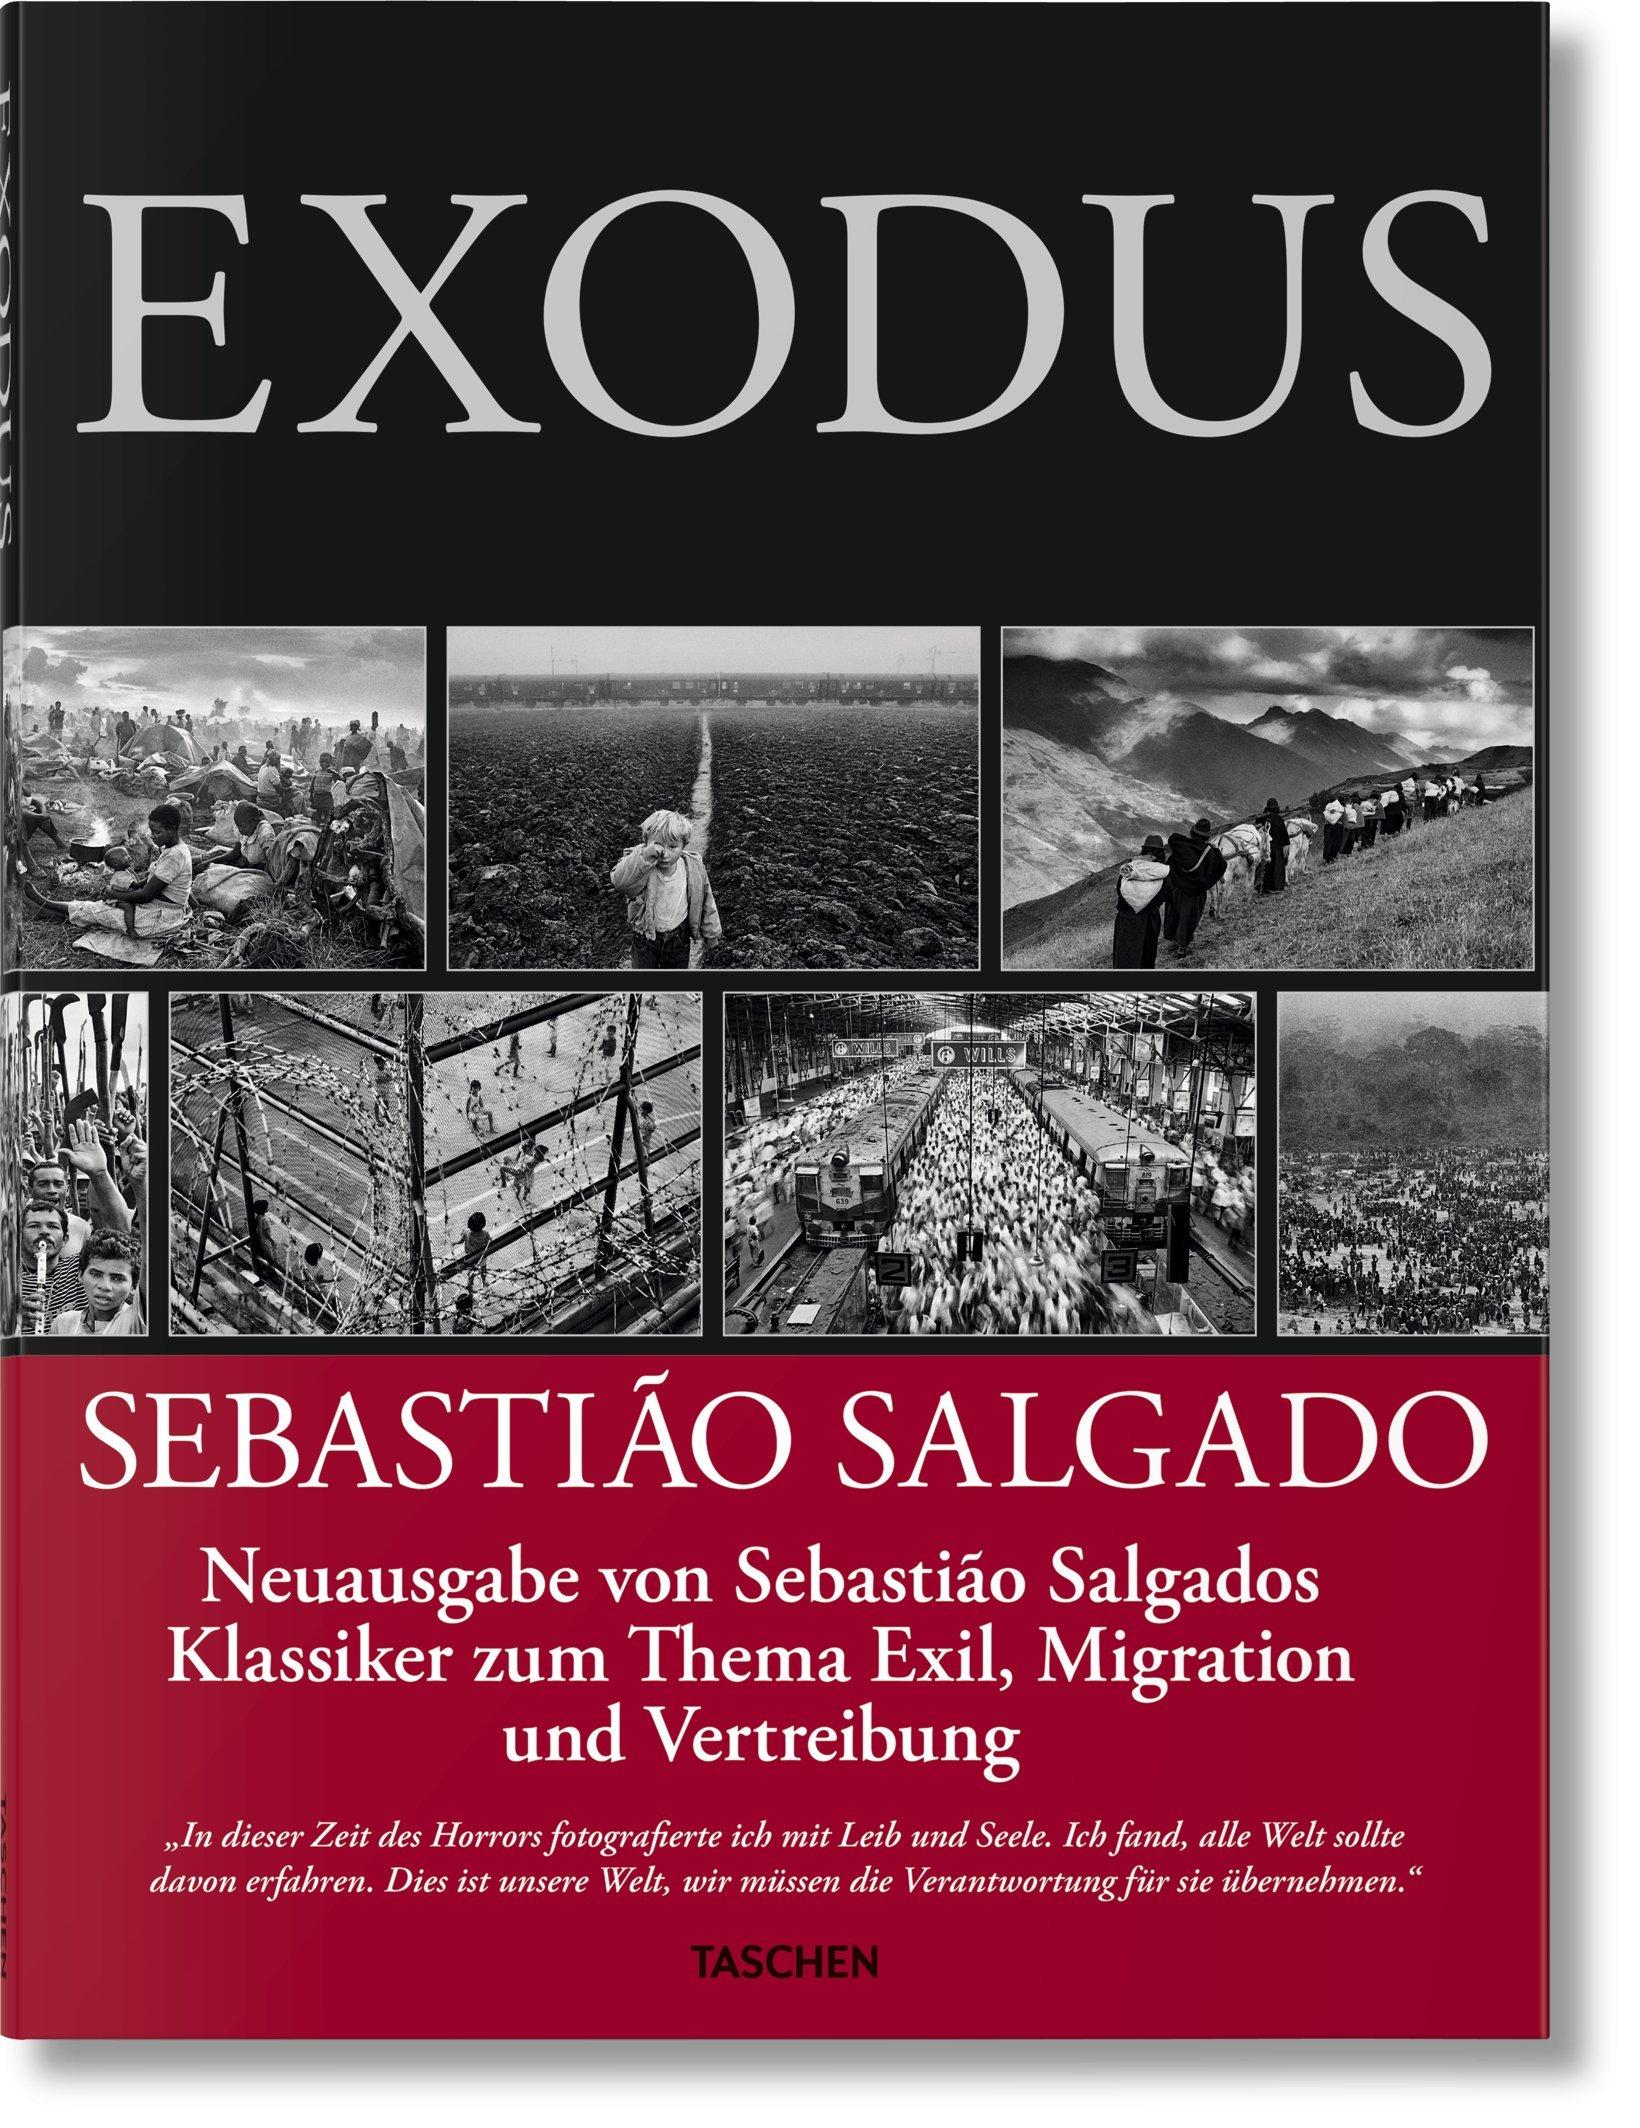 fo-salgado_exodus-cover_05315